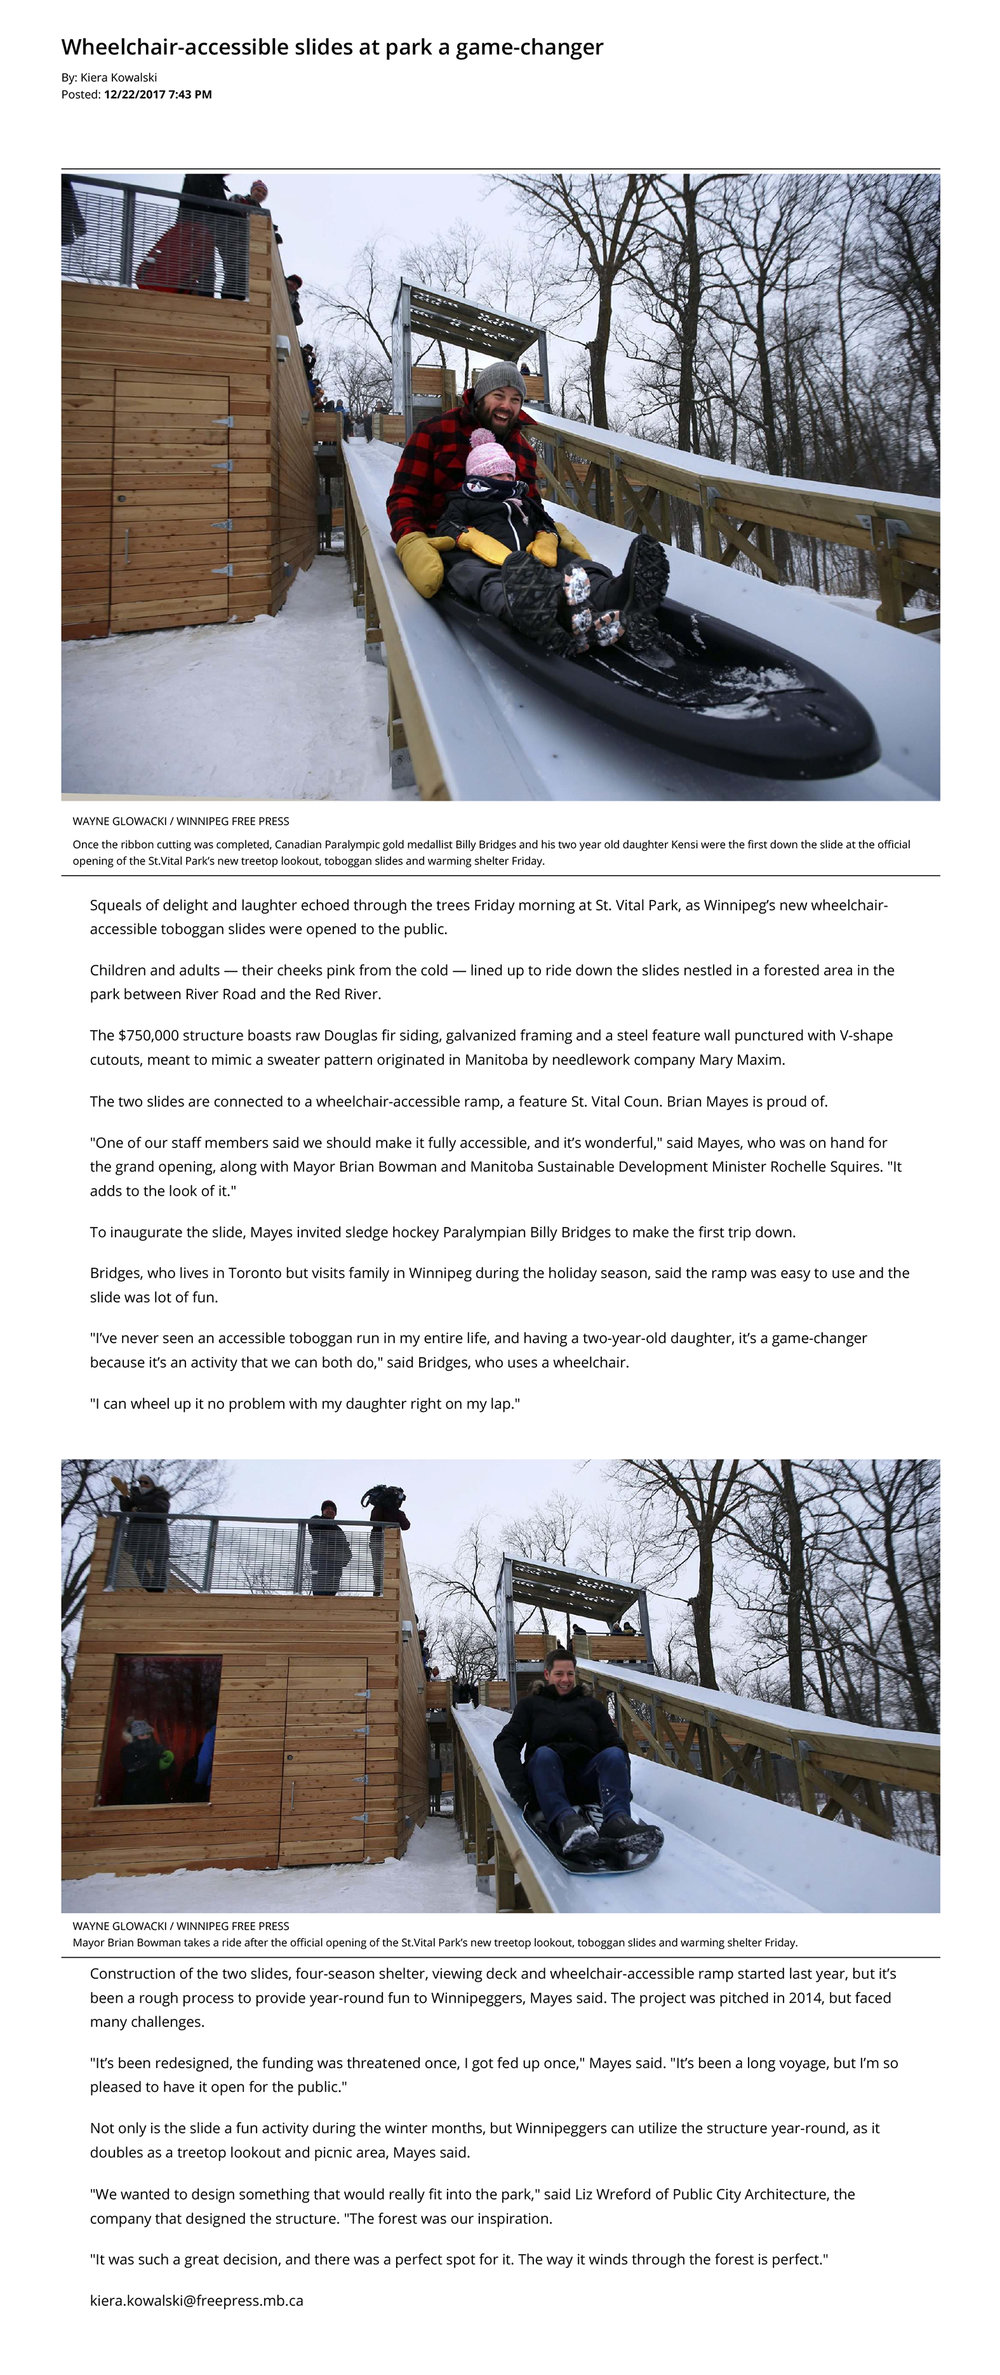 Wheelchair-accessible slides at park a game-changer - Winnipeg Free Press-1.jpg